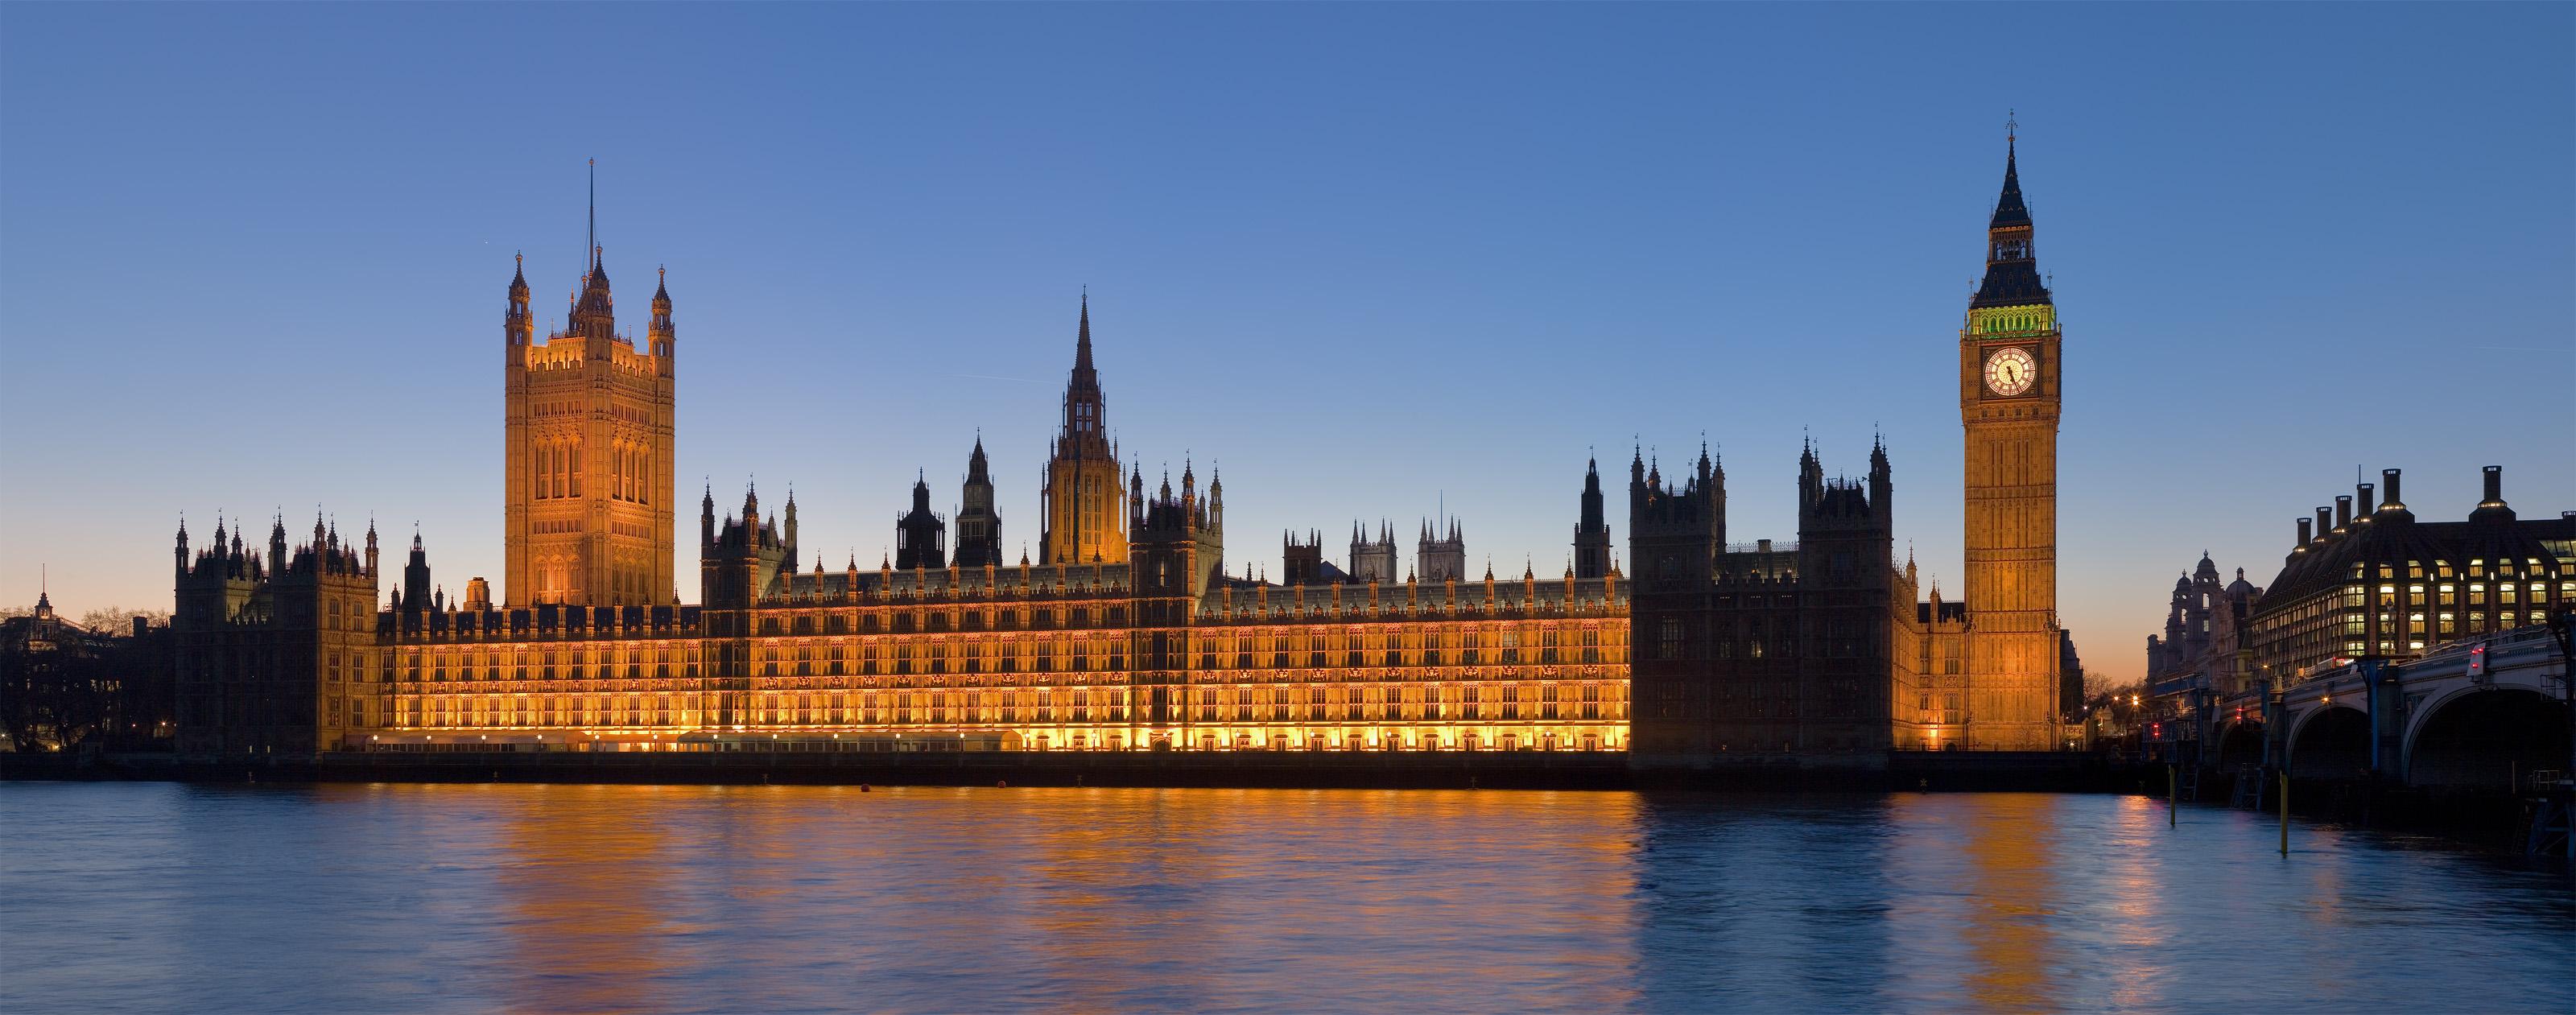 Two British scientific advisers warn it's too soon to lift lockdown